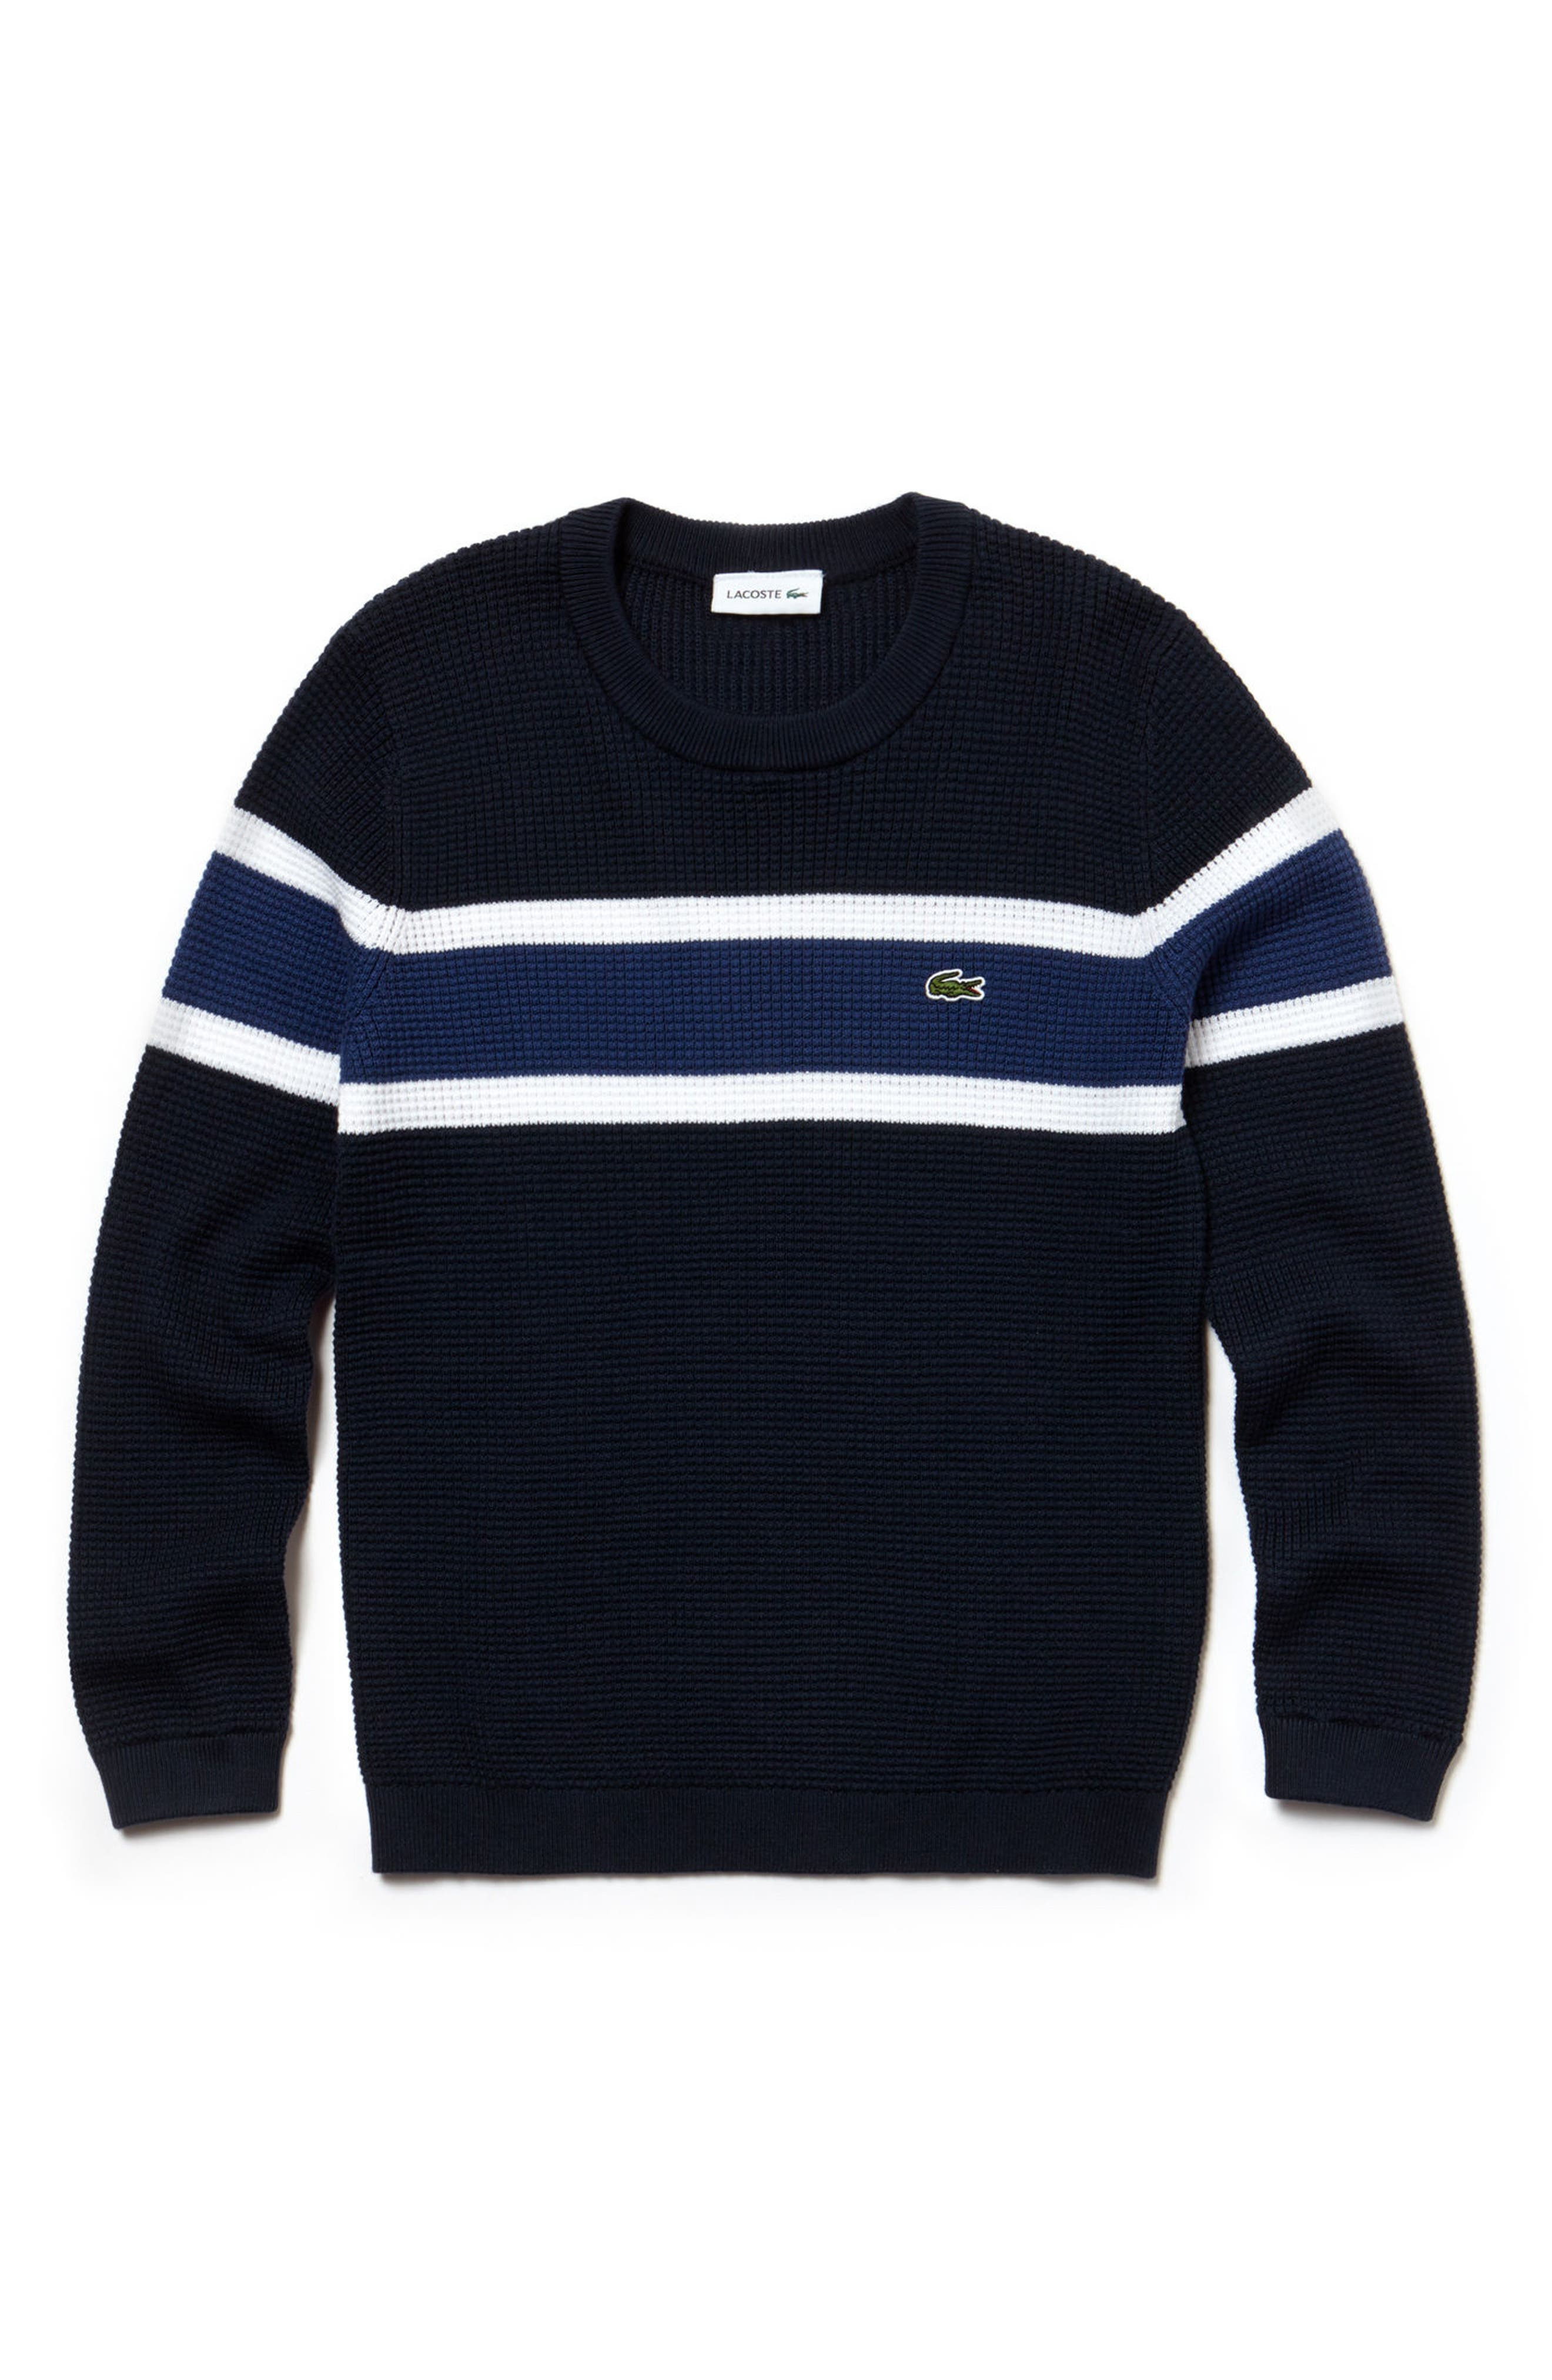 Piqué Effect Knit Sweater,                             Main thumbnail 1, color,                             Navy Blue/ White